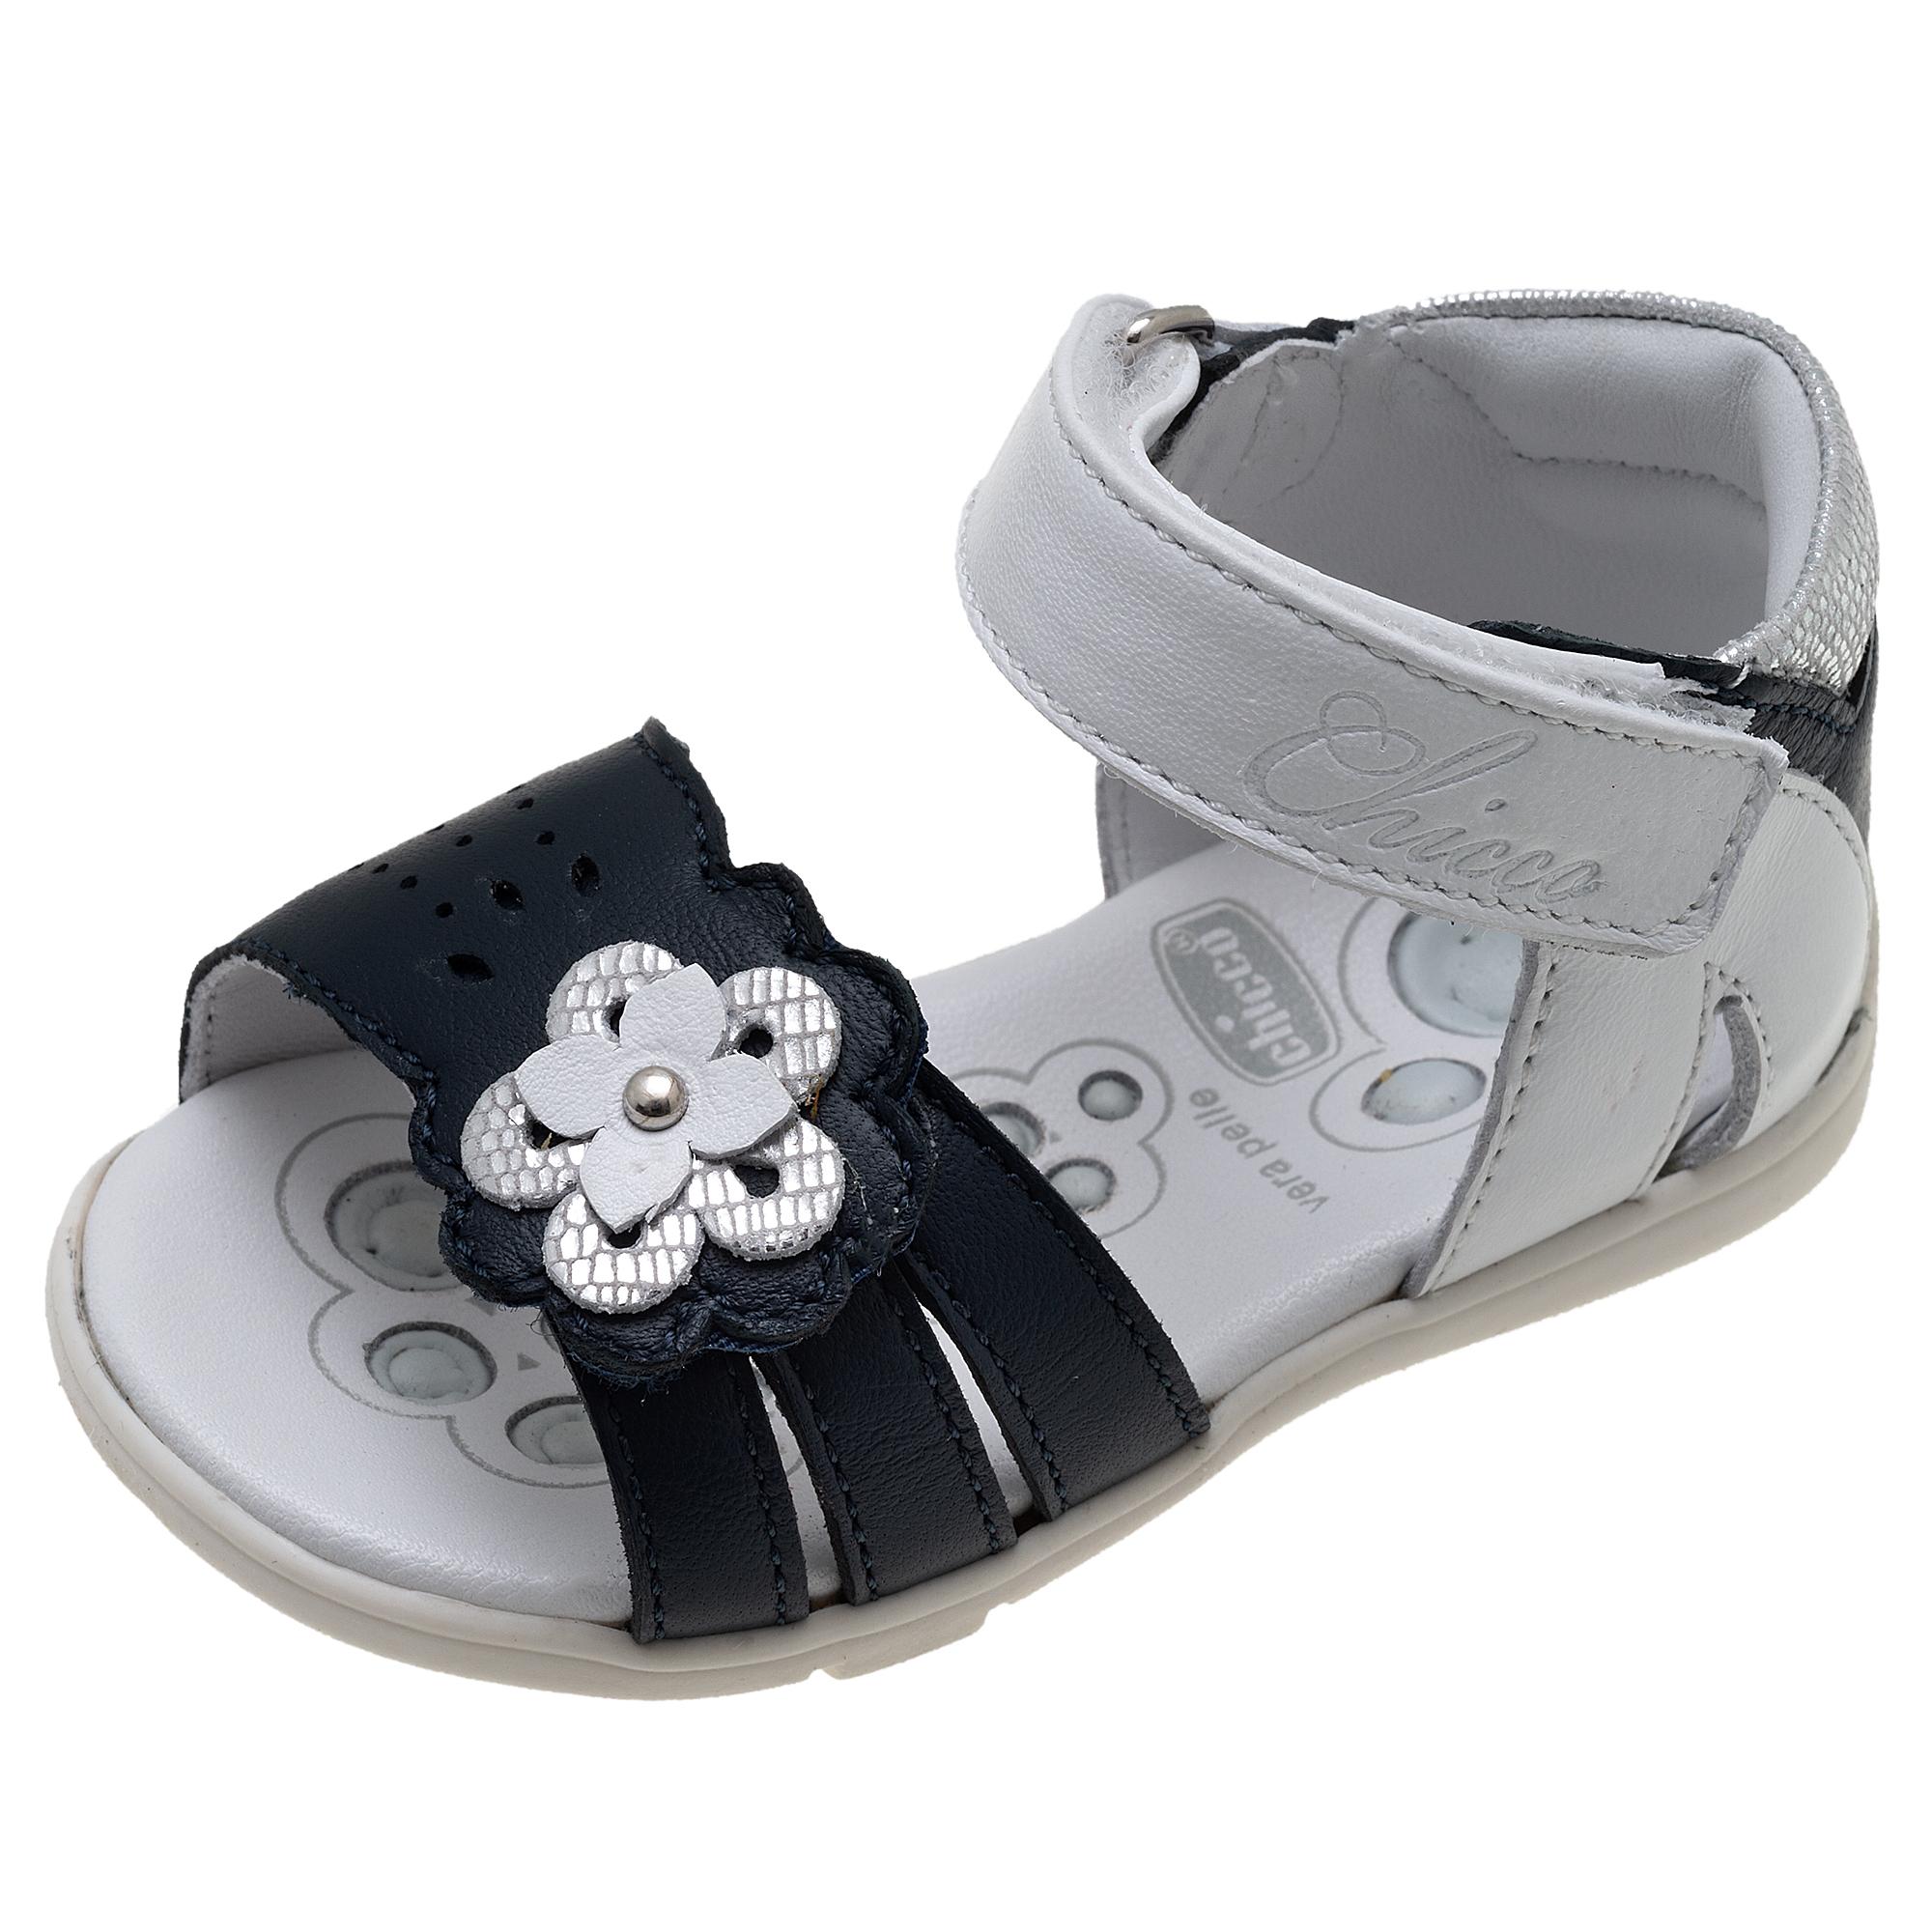 Sandalute Copii Chicco Gemmas, Bleumarin, 61479 imagine